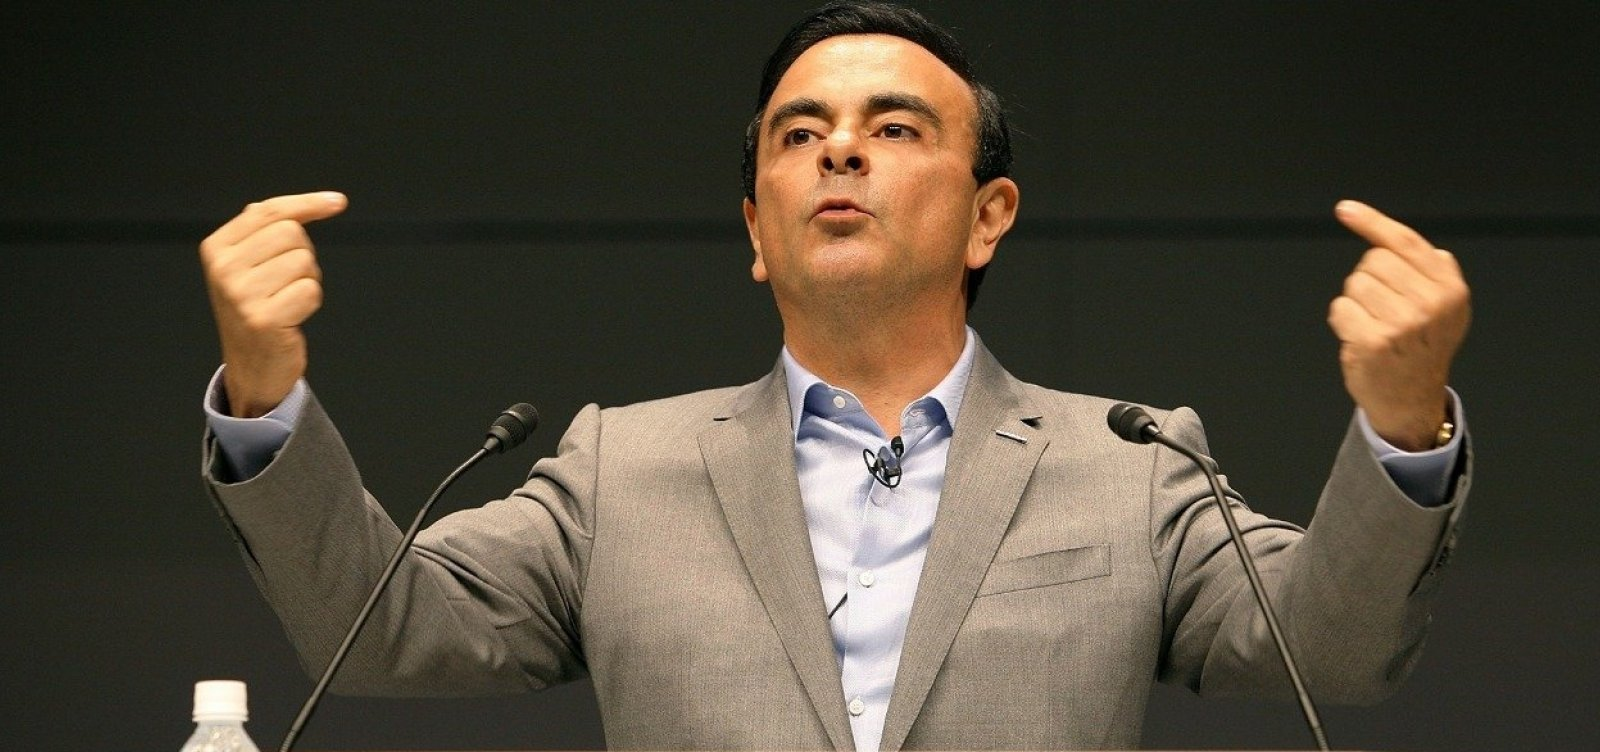 [Promotoria japonesa apresenta novas acusações contra Carlos Ghosn]